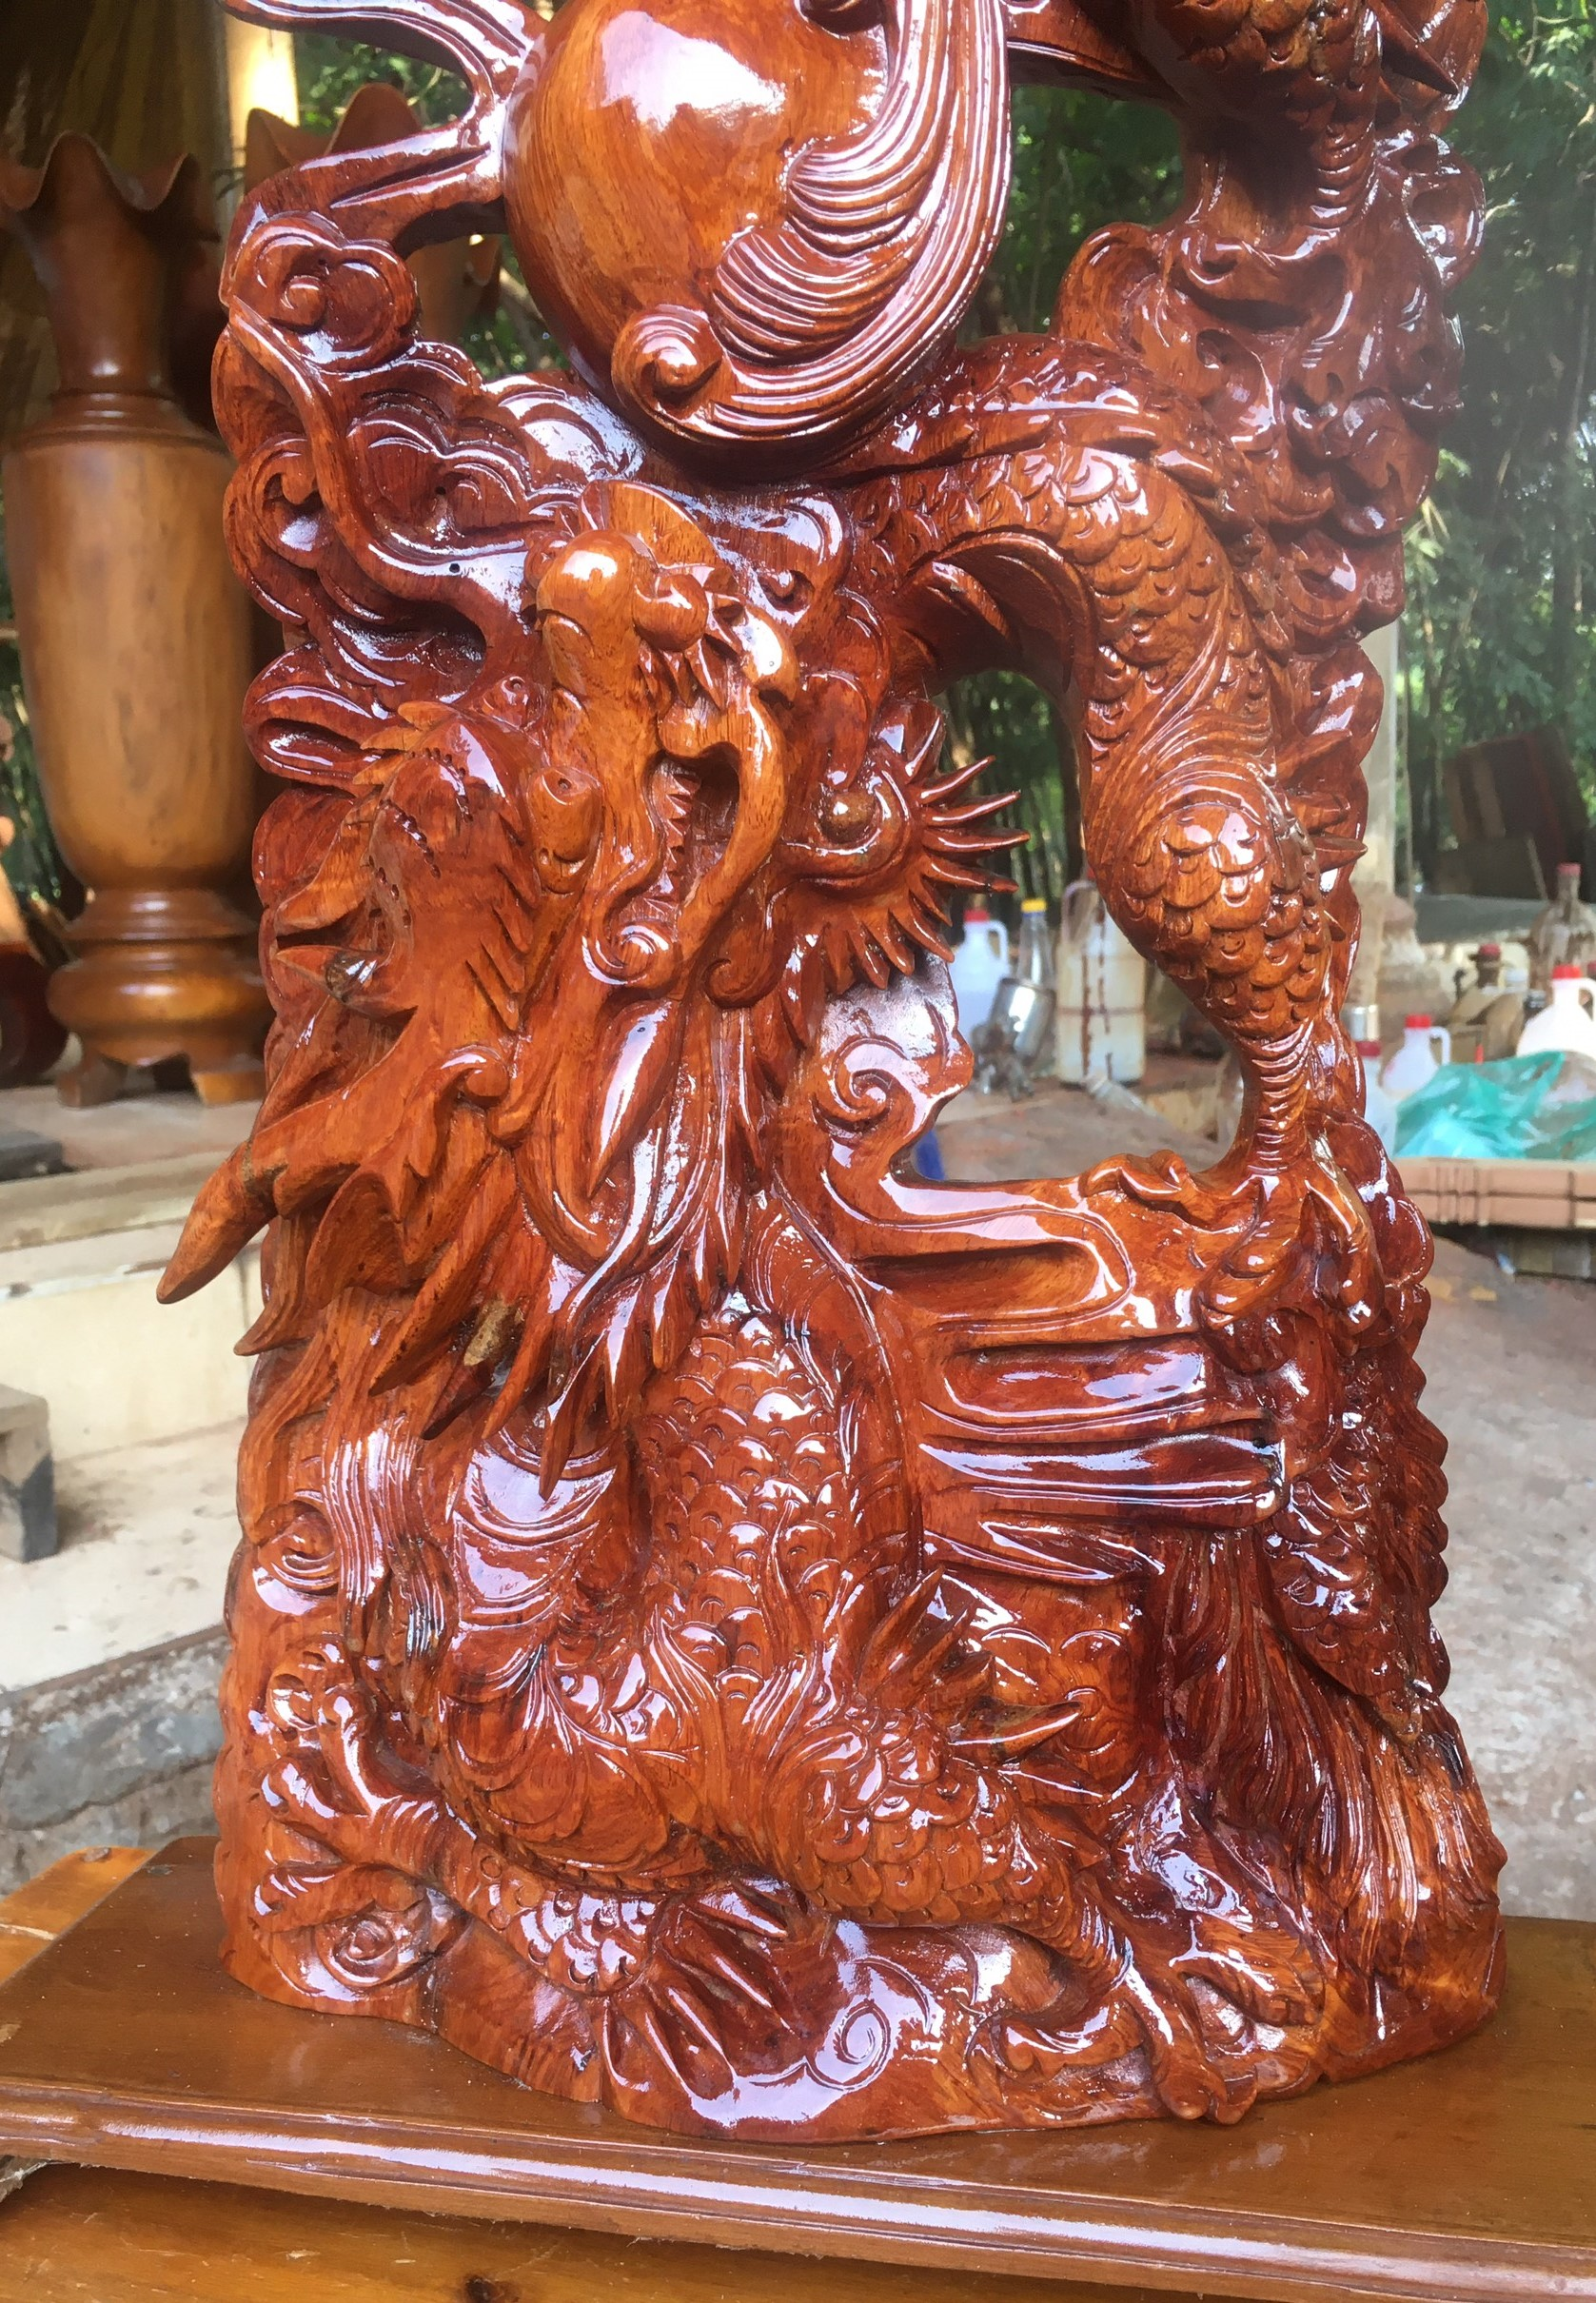 Tượng Song long - 2 con rồng - gỗ Hương Gia Lai cao 84cm